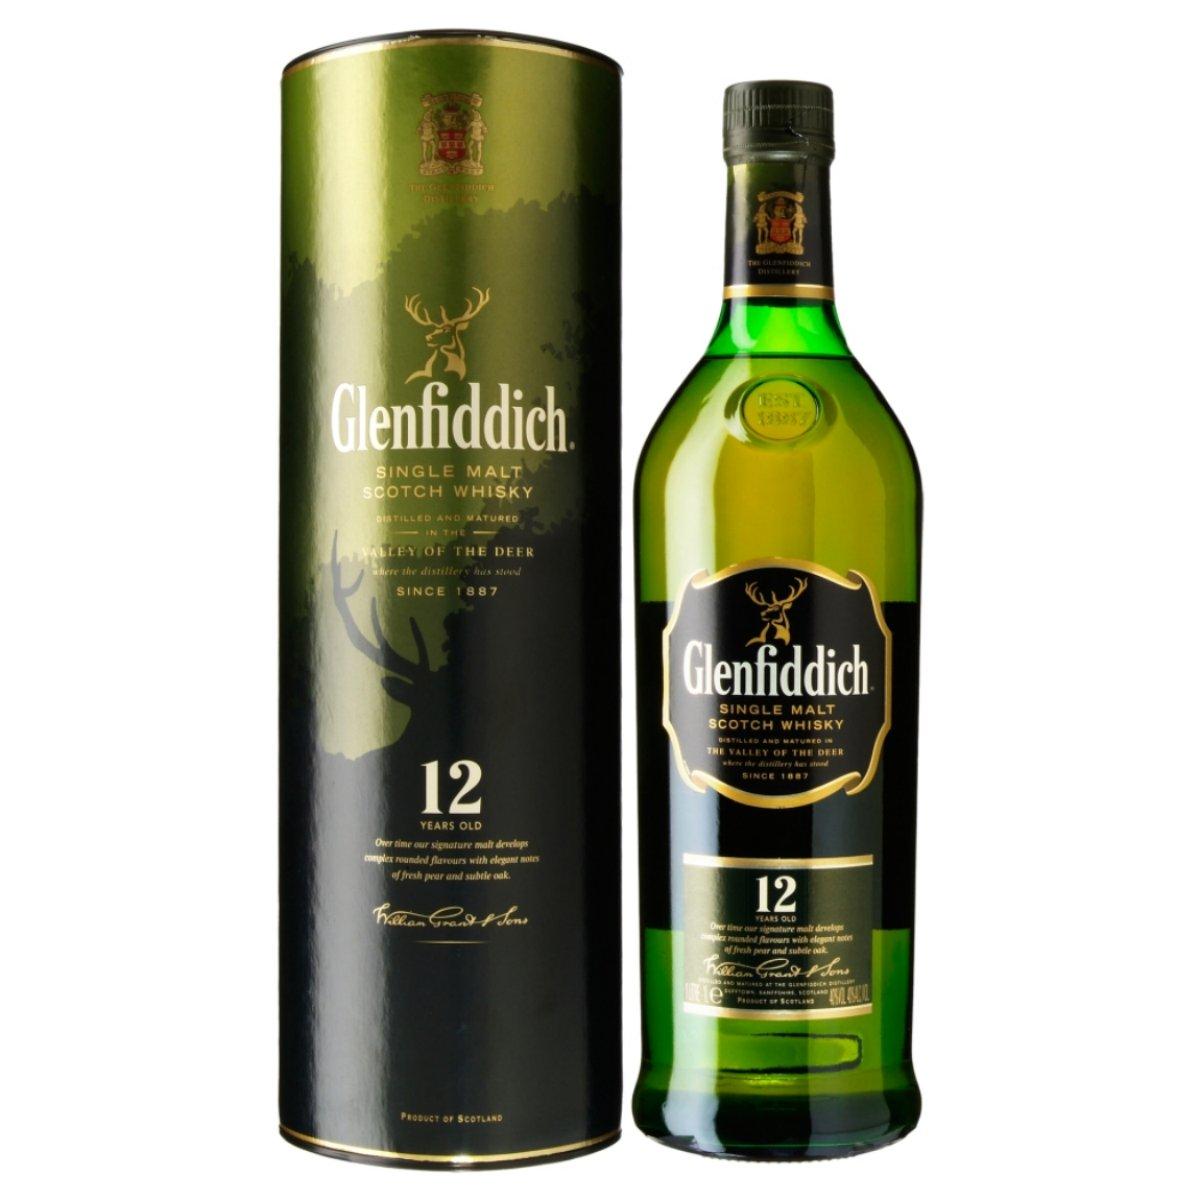 Glenfiddich Single Malt Scotch Whisky 12 Years Old 1l